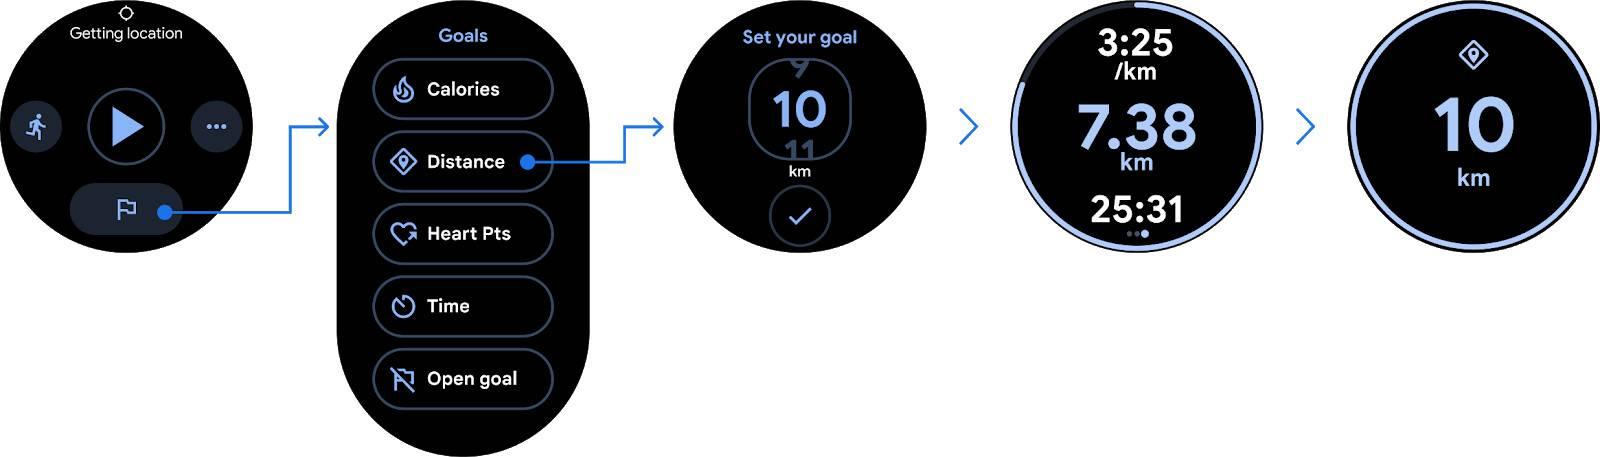 Google详细介绍了新的Fit锻炼功能,使其可用于Wear OS设备